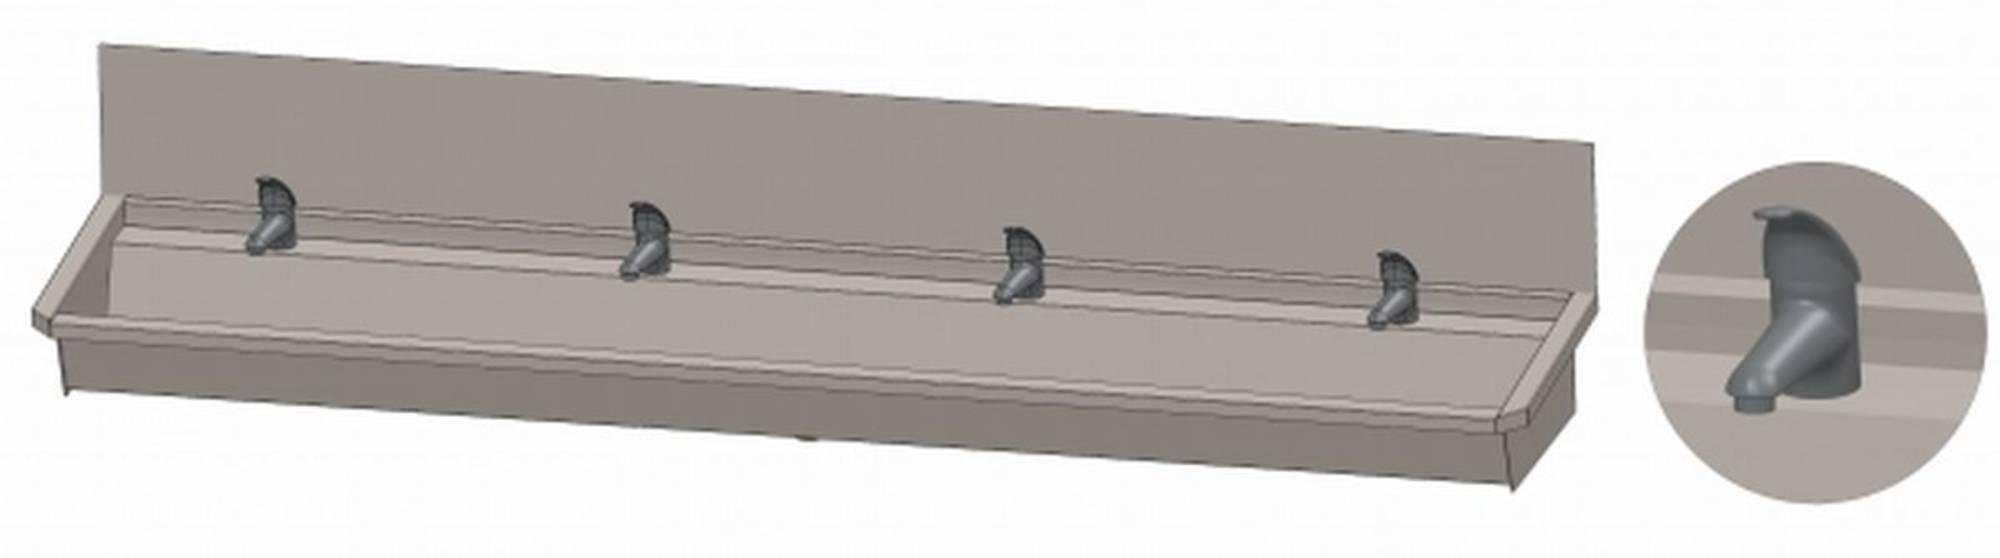 INTERSAN SANILAV wasgoot met spatbord 240 cm. met 4 1-greeps kranen INOX 304 (304L4)